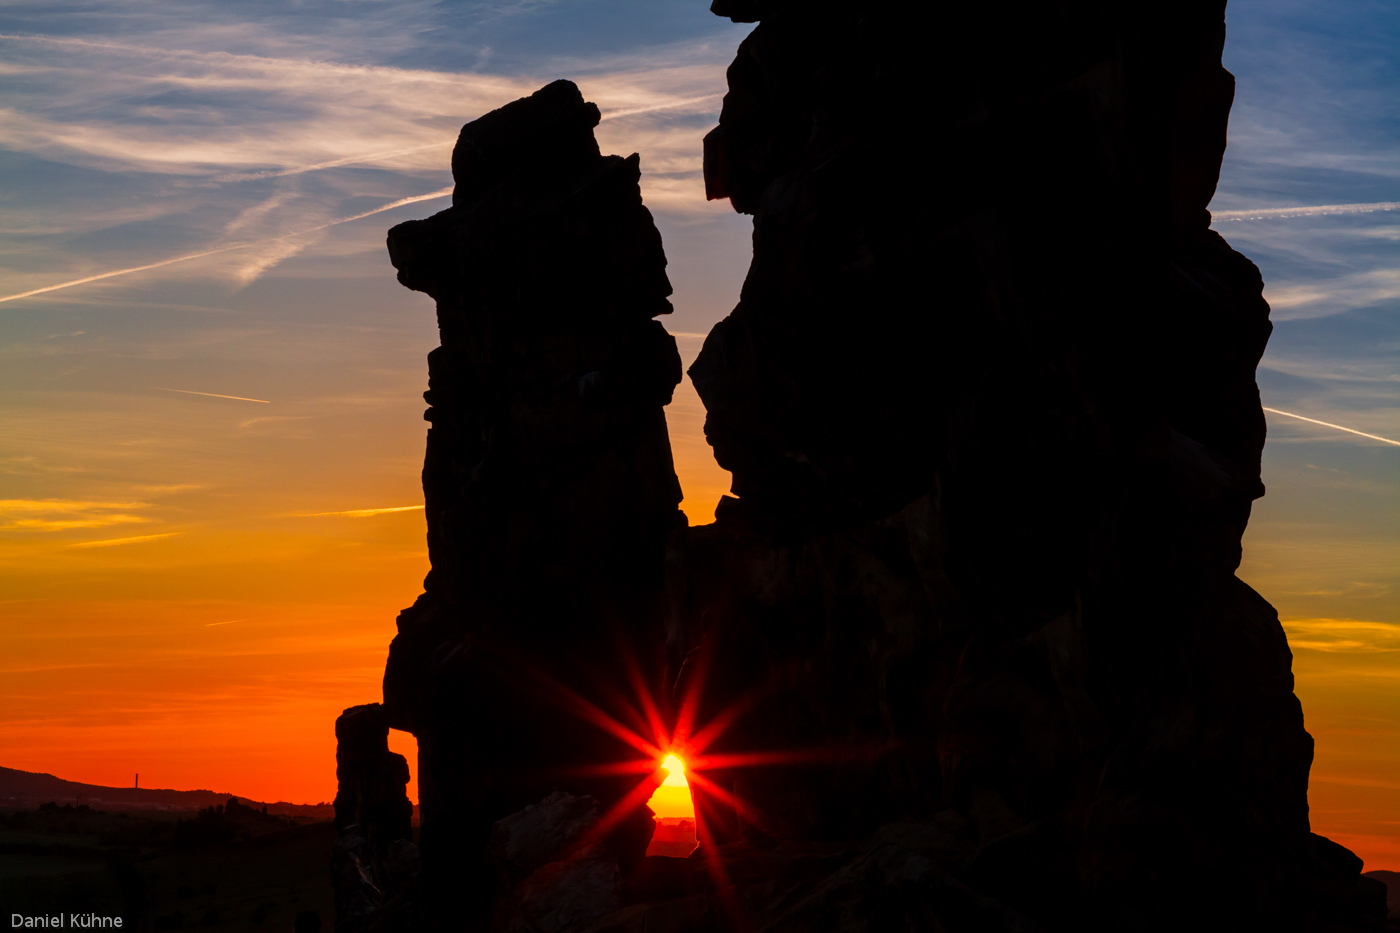 Sonnenuntergang an der Teufelsmauer bei Weddersleben im Harz